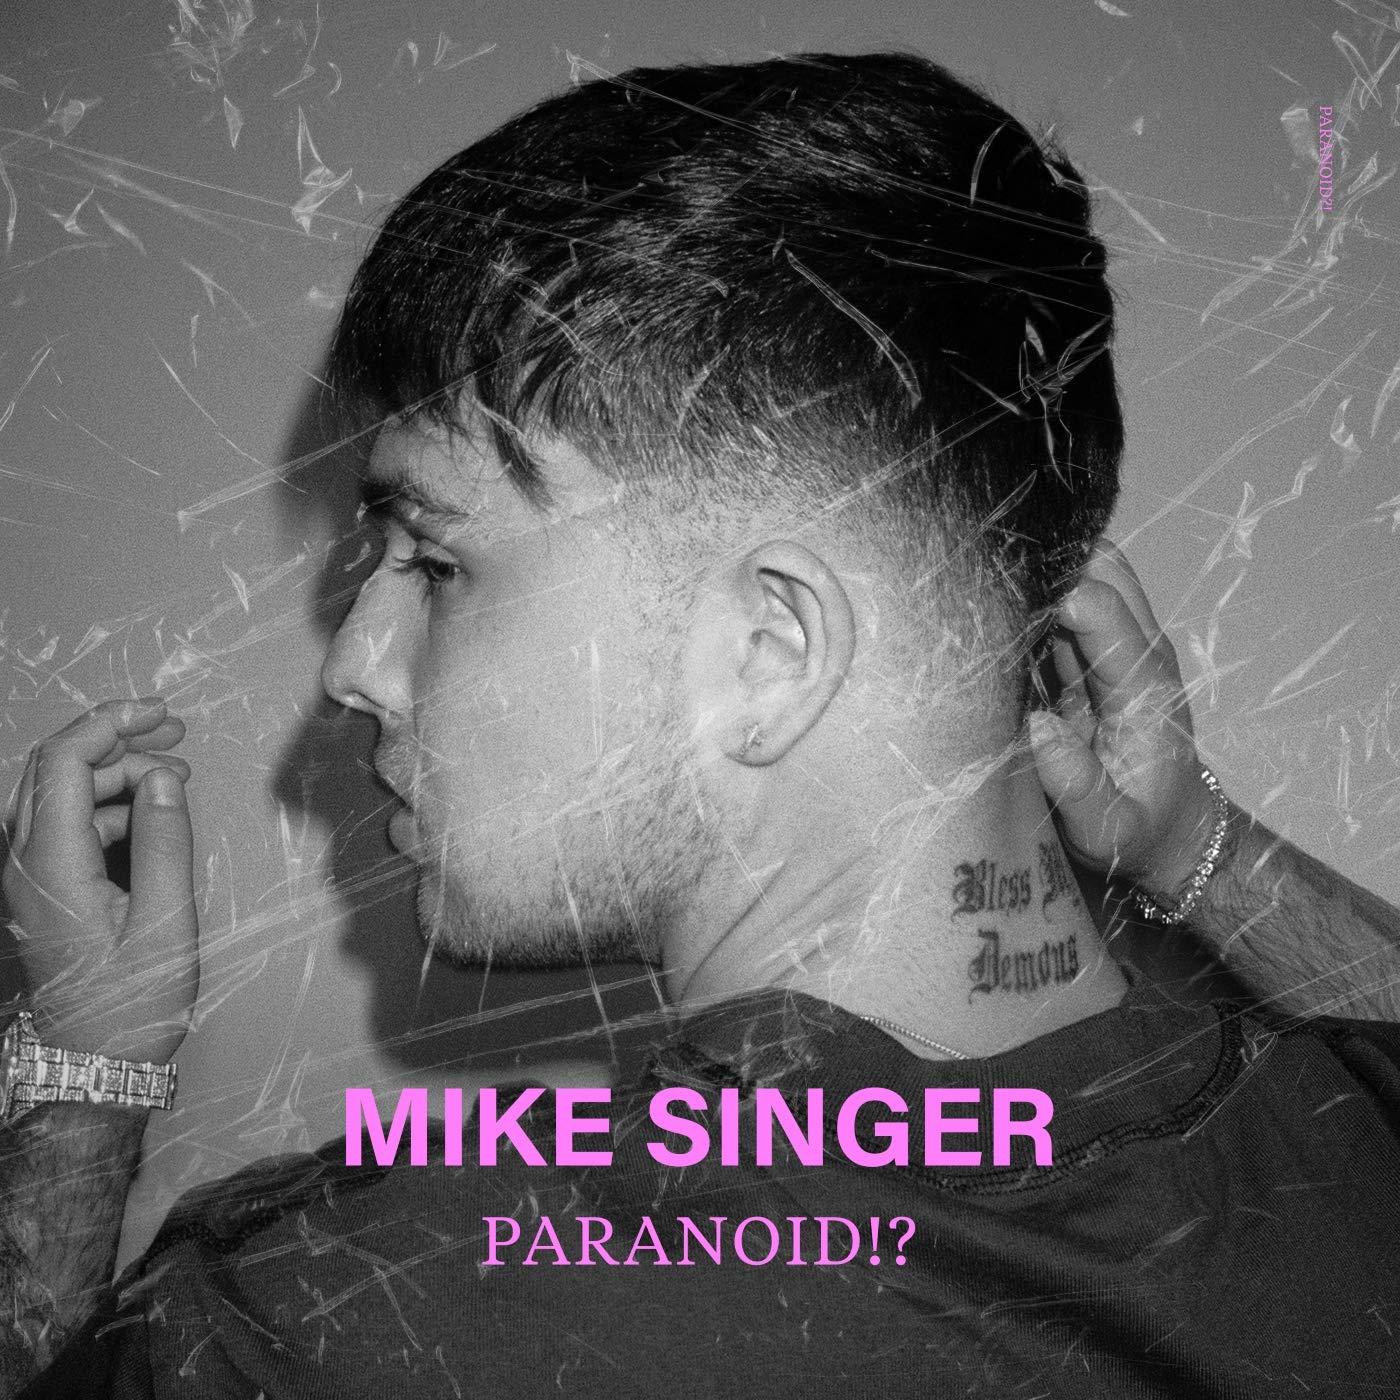 Singer Mike Paranoid Ltd Fanbox Amazon Com Music